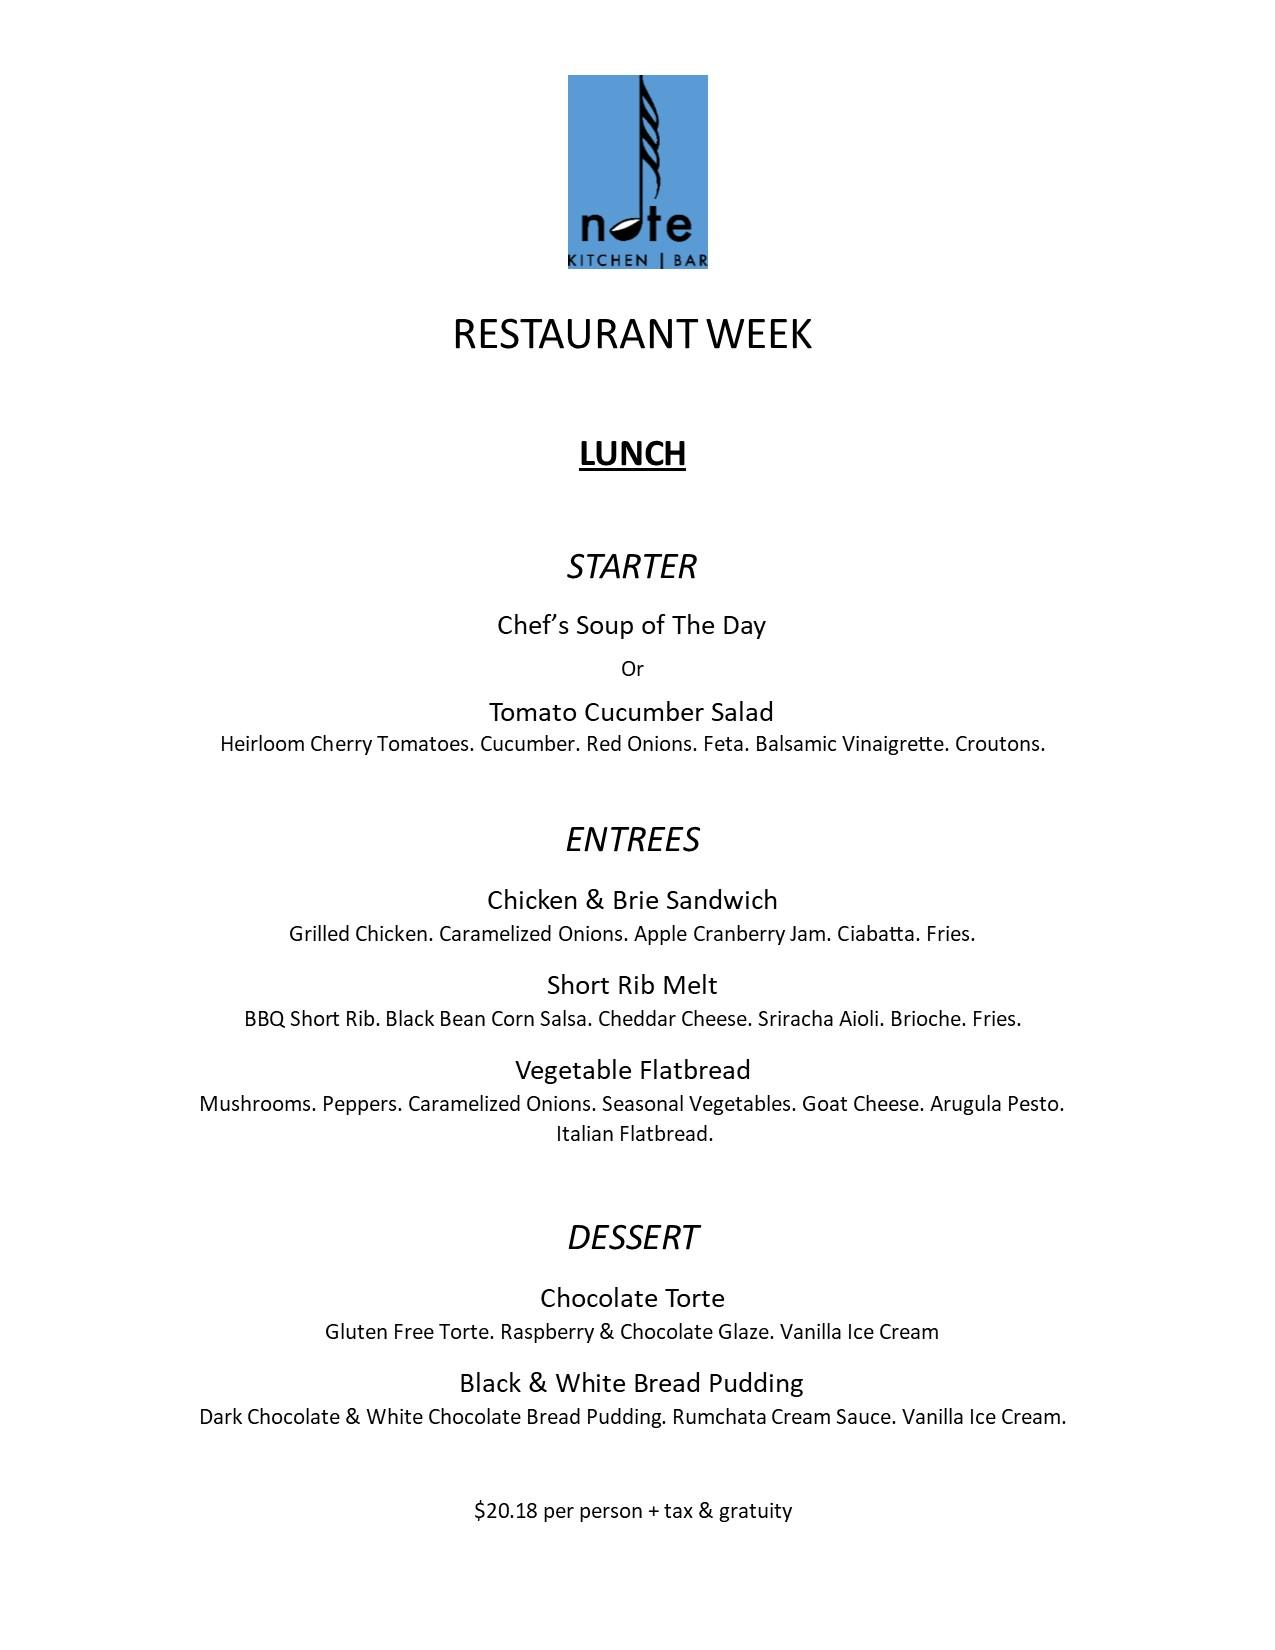 Bethel Restaurant Week 2018 | Connecticut Restaurant Week